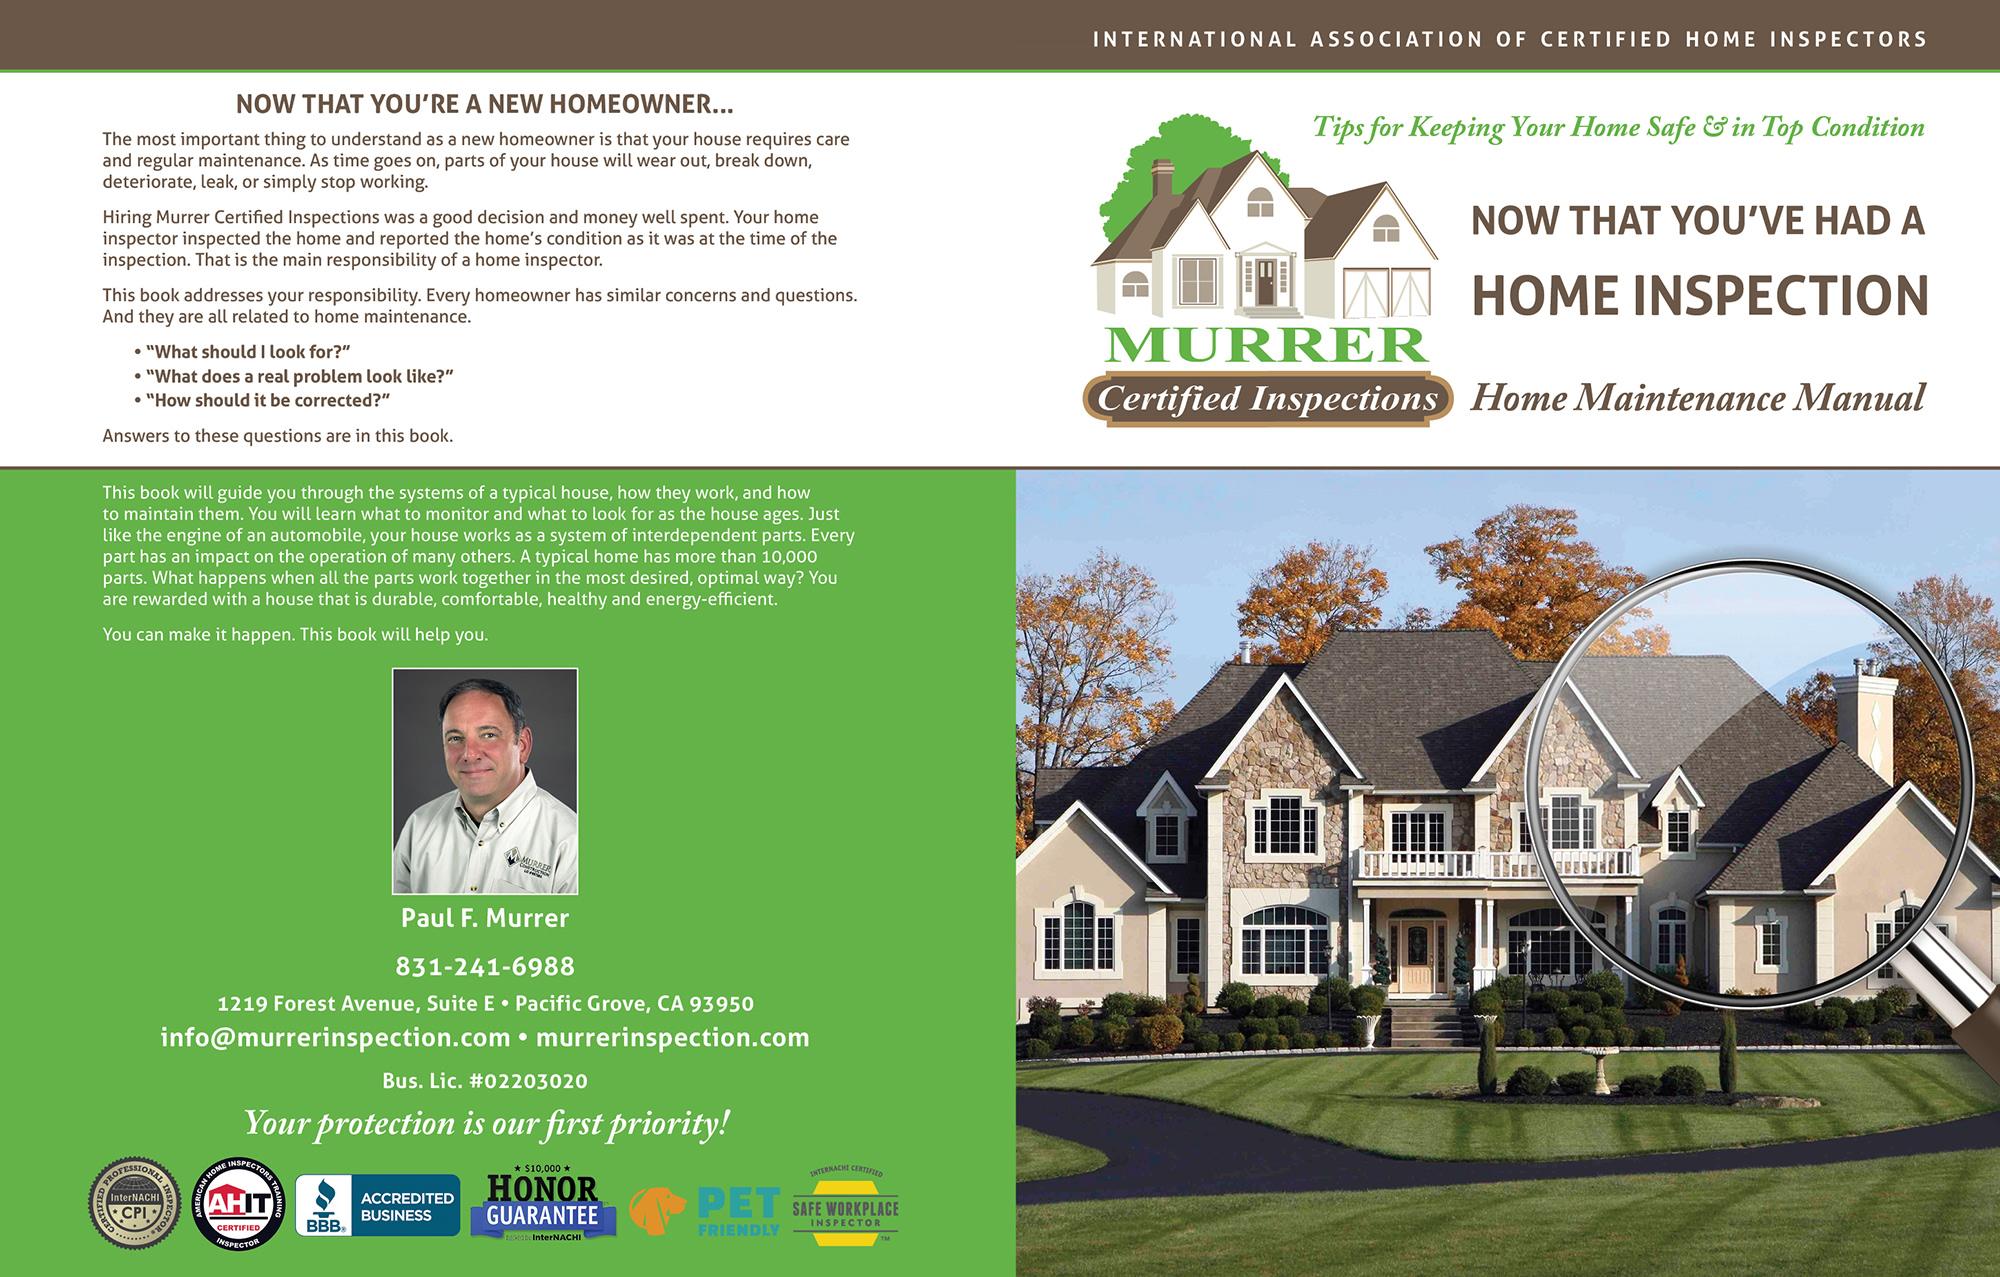 Custom Home Maintenance Book for Murrer Certified Inspections.